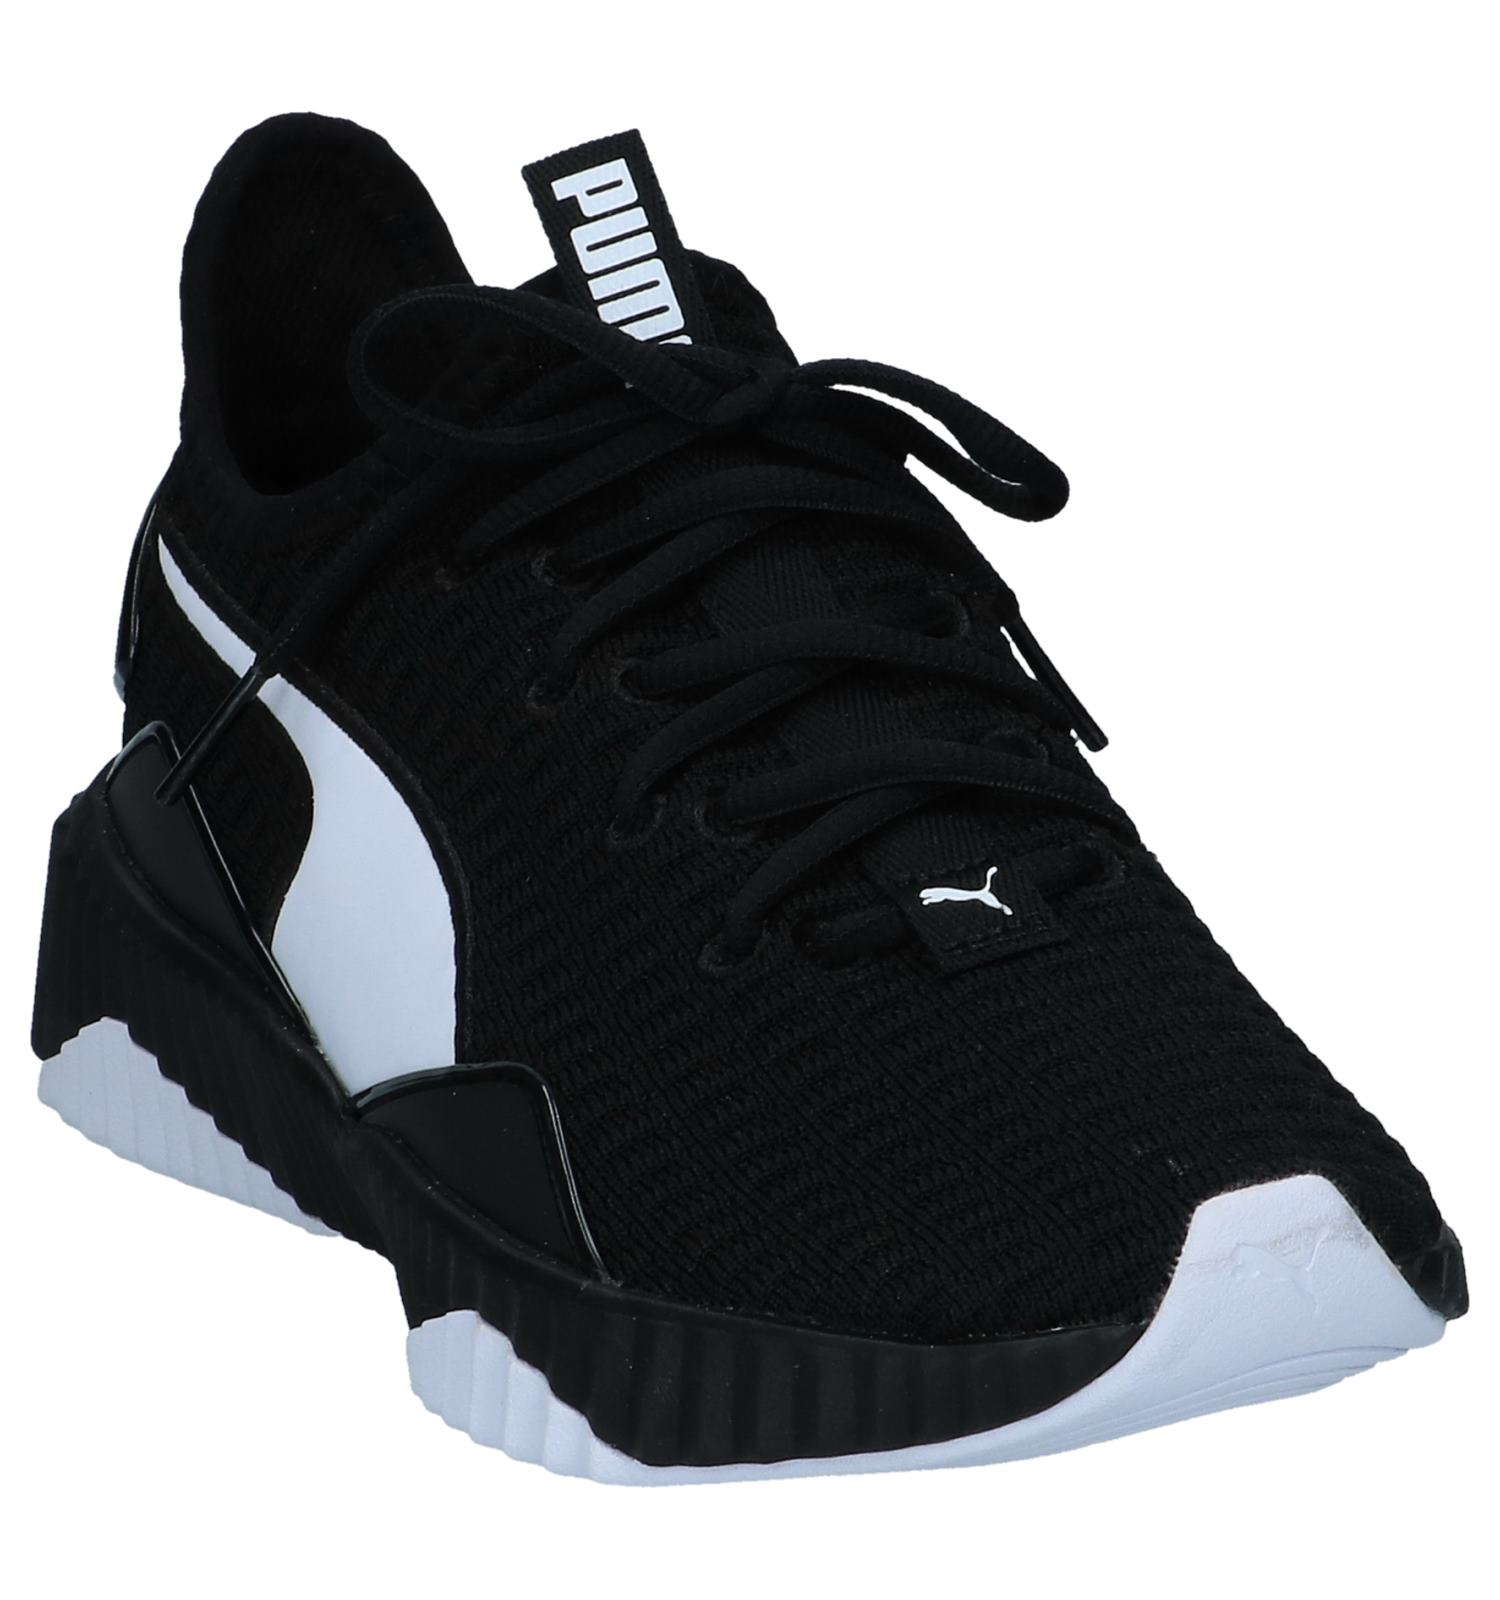 Sneakers Defy Zwarte Runner Runner Zwarte Puma Sneakers 34RLScAq5j